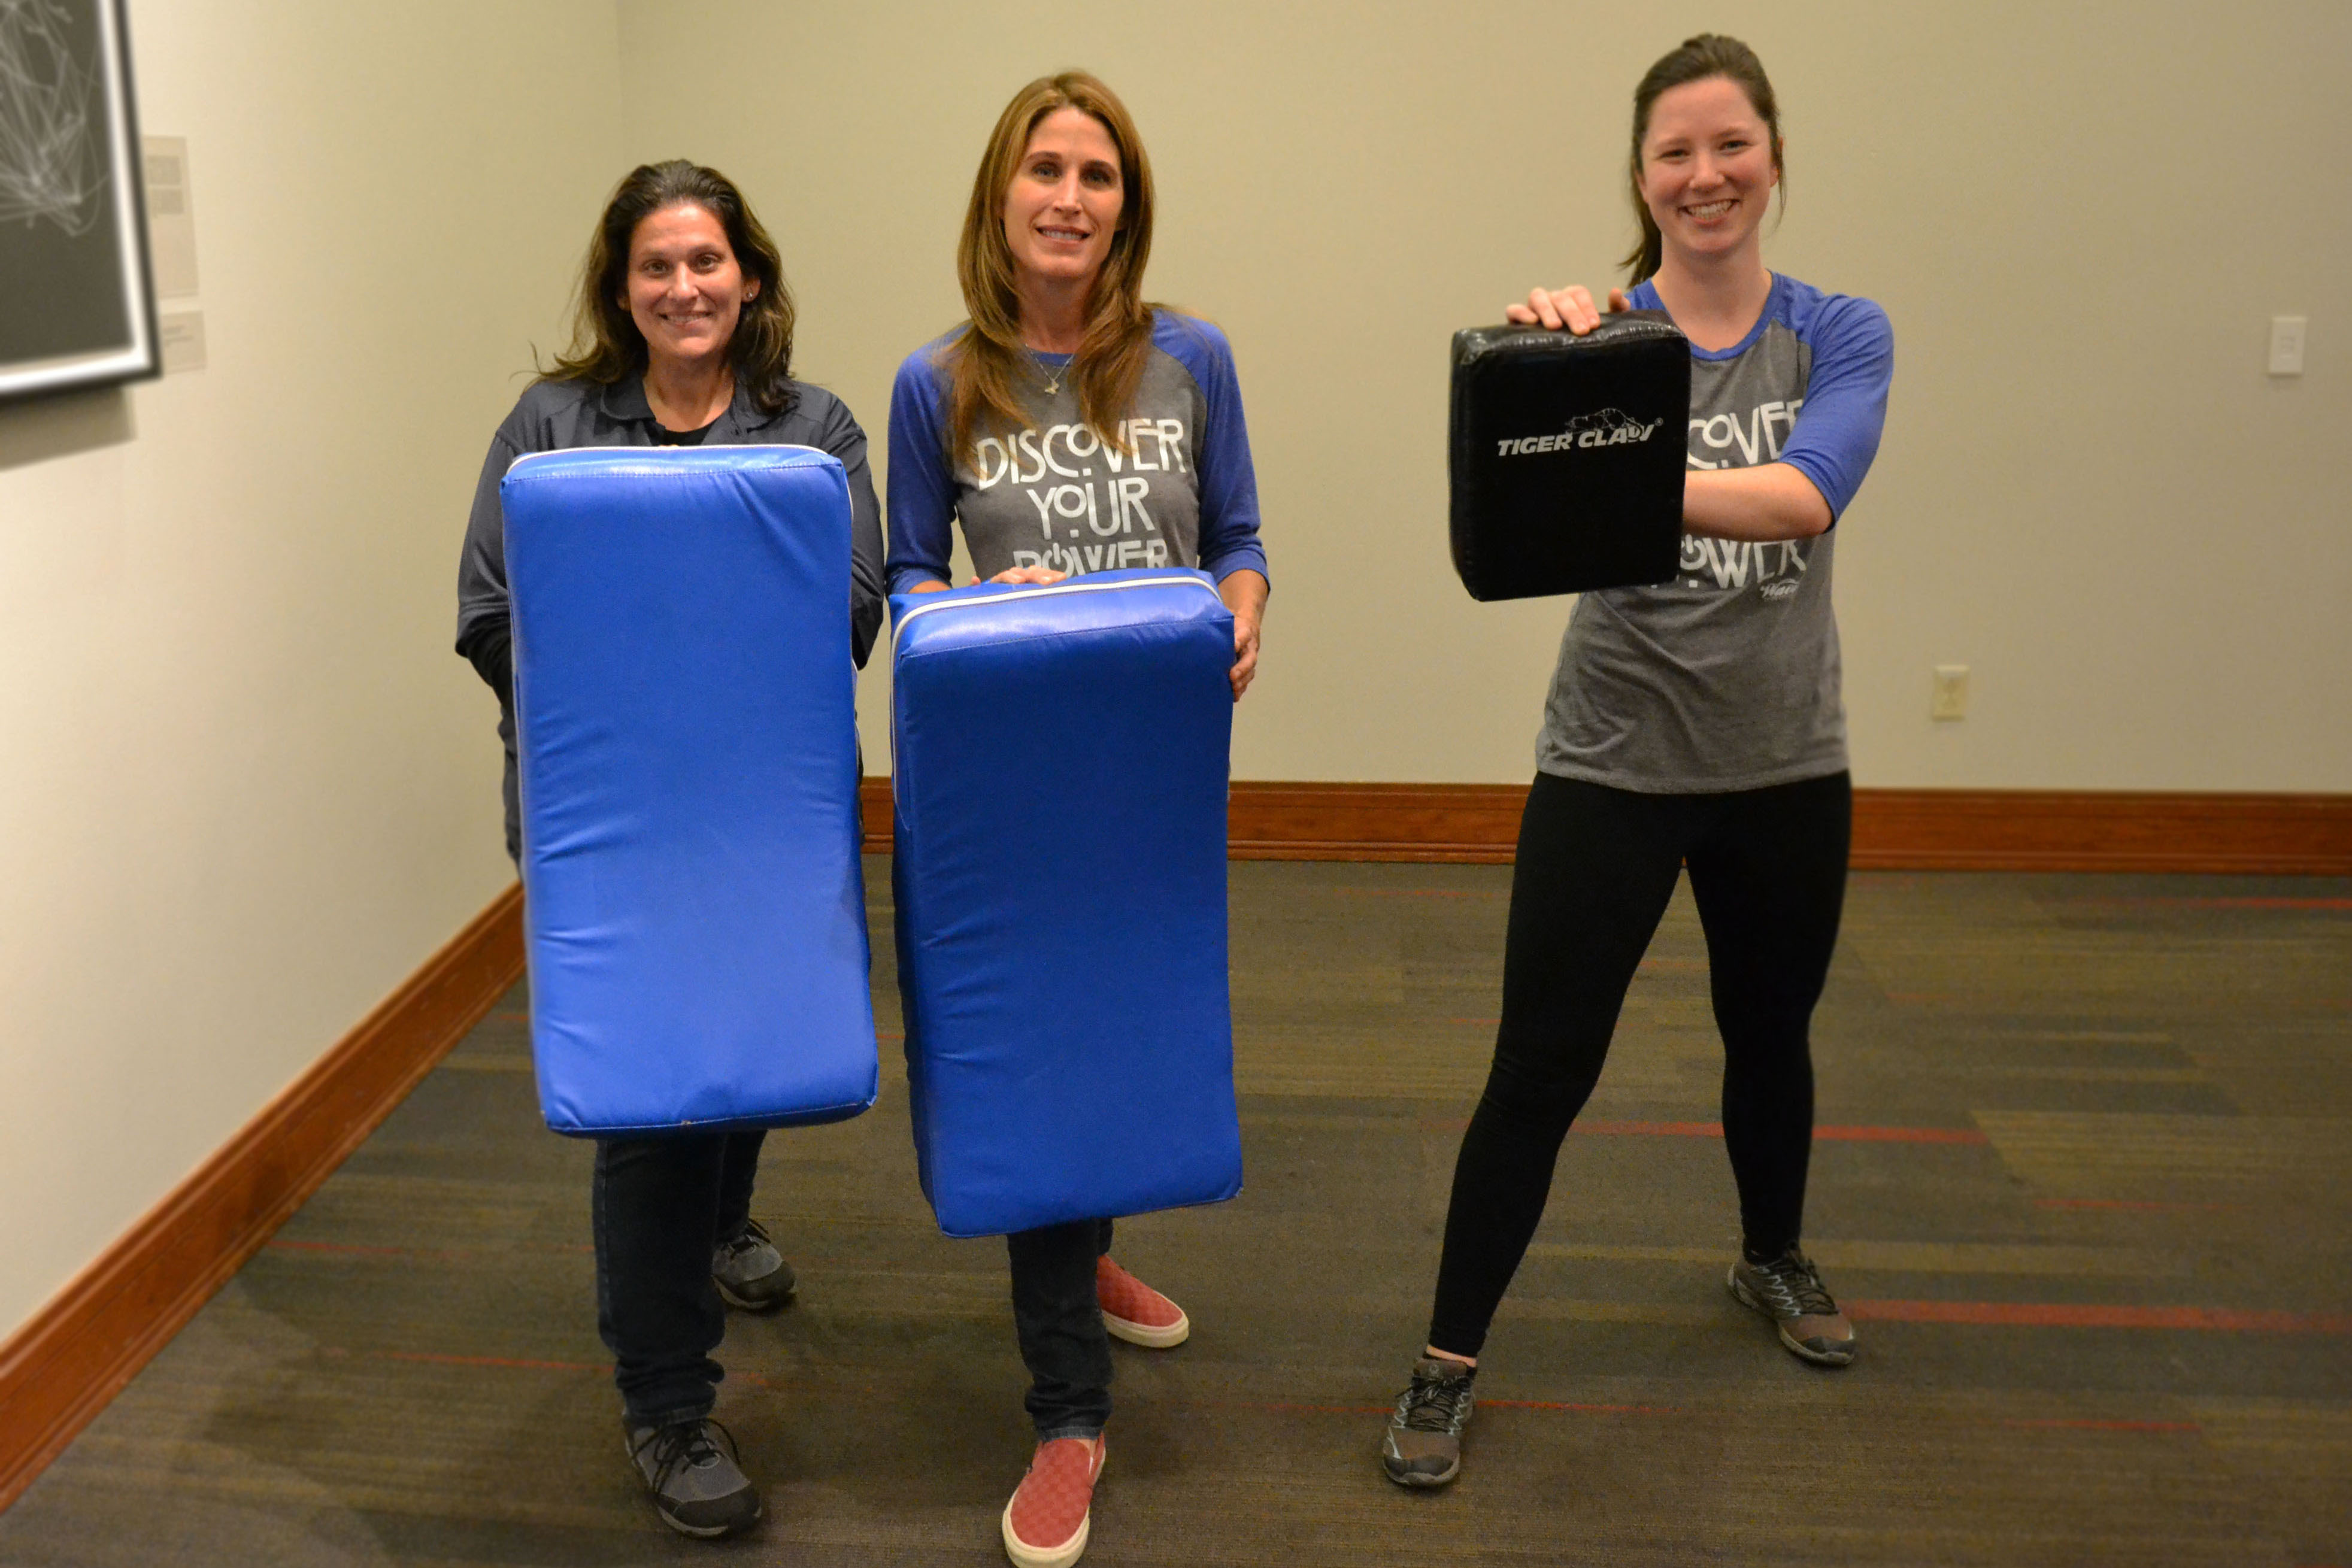 Self Defense Workshops Empower Students at Seattle U